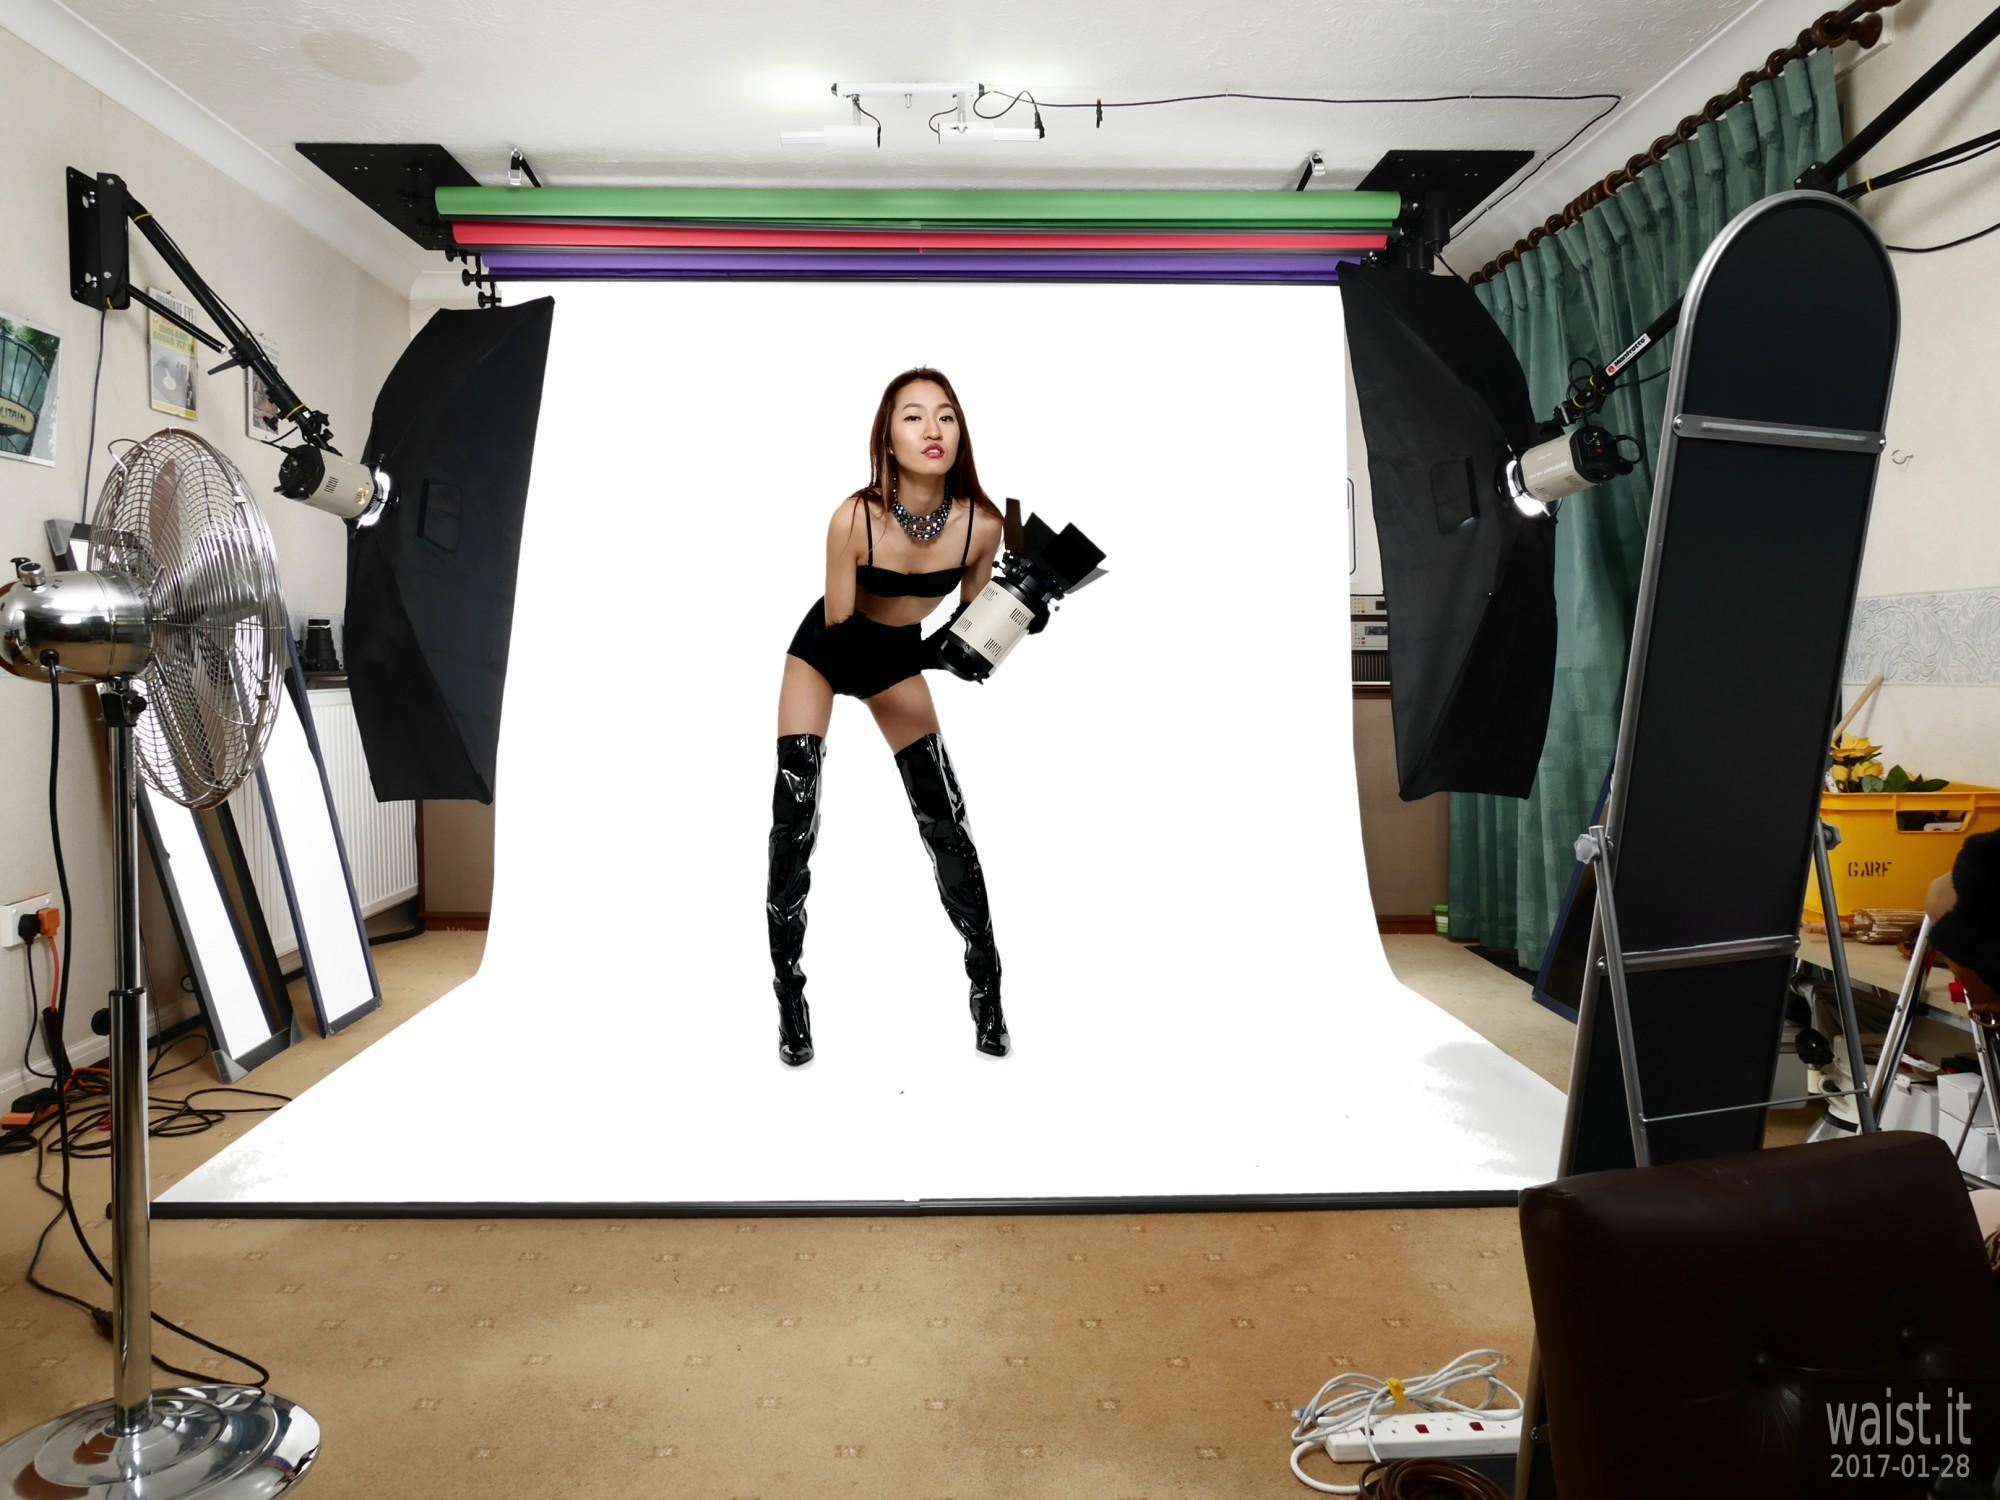 2017-01-28 Salina Pun black bra, girdle, opera gloves and patent leather thigh boots, studio long shot